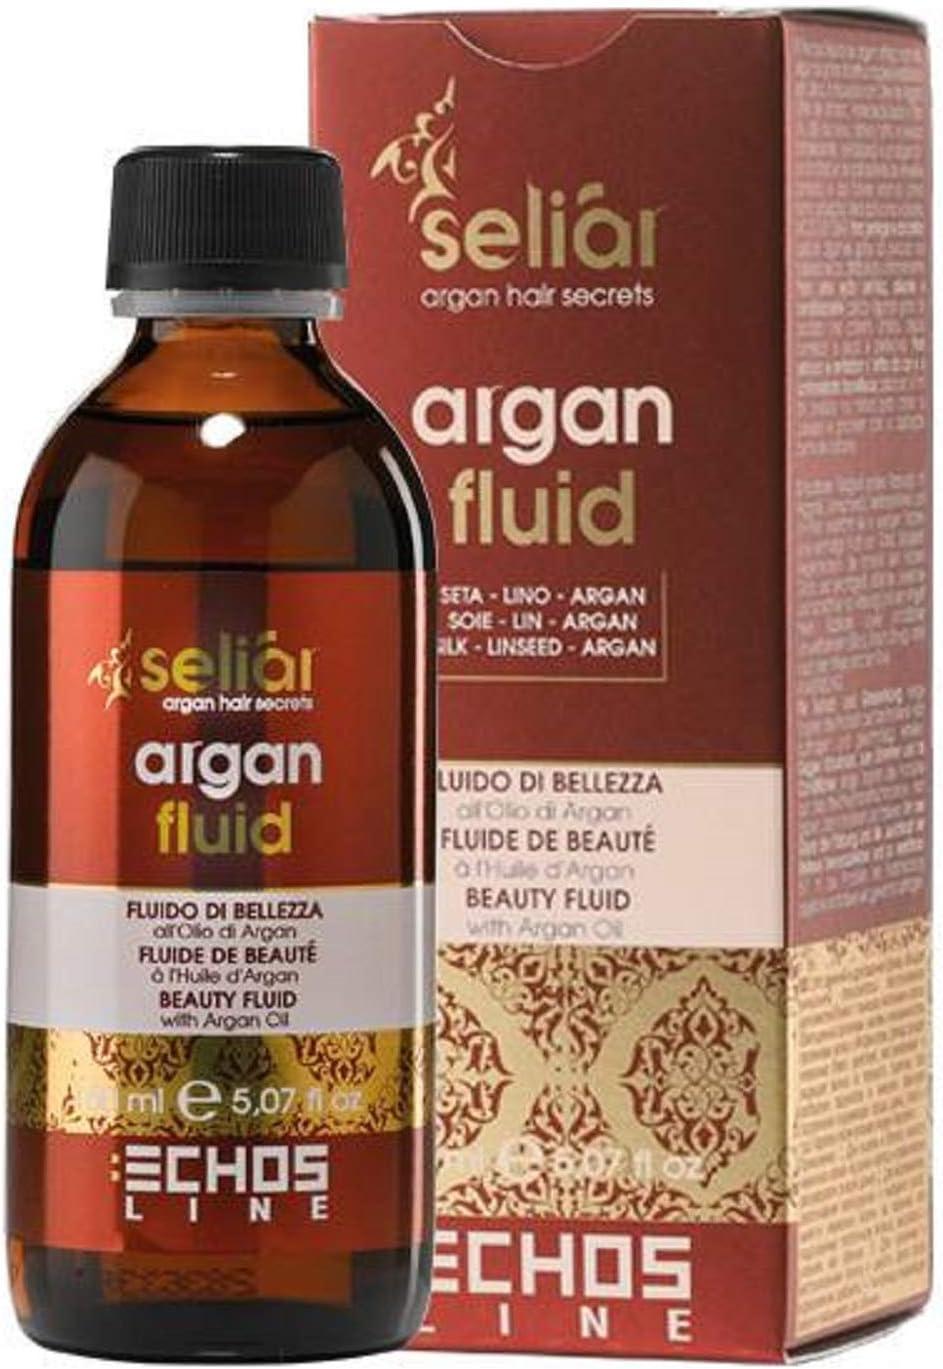 ECHOSLINE Seliar Aceite De Argan 150 ml